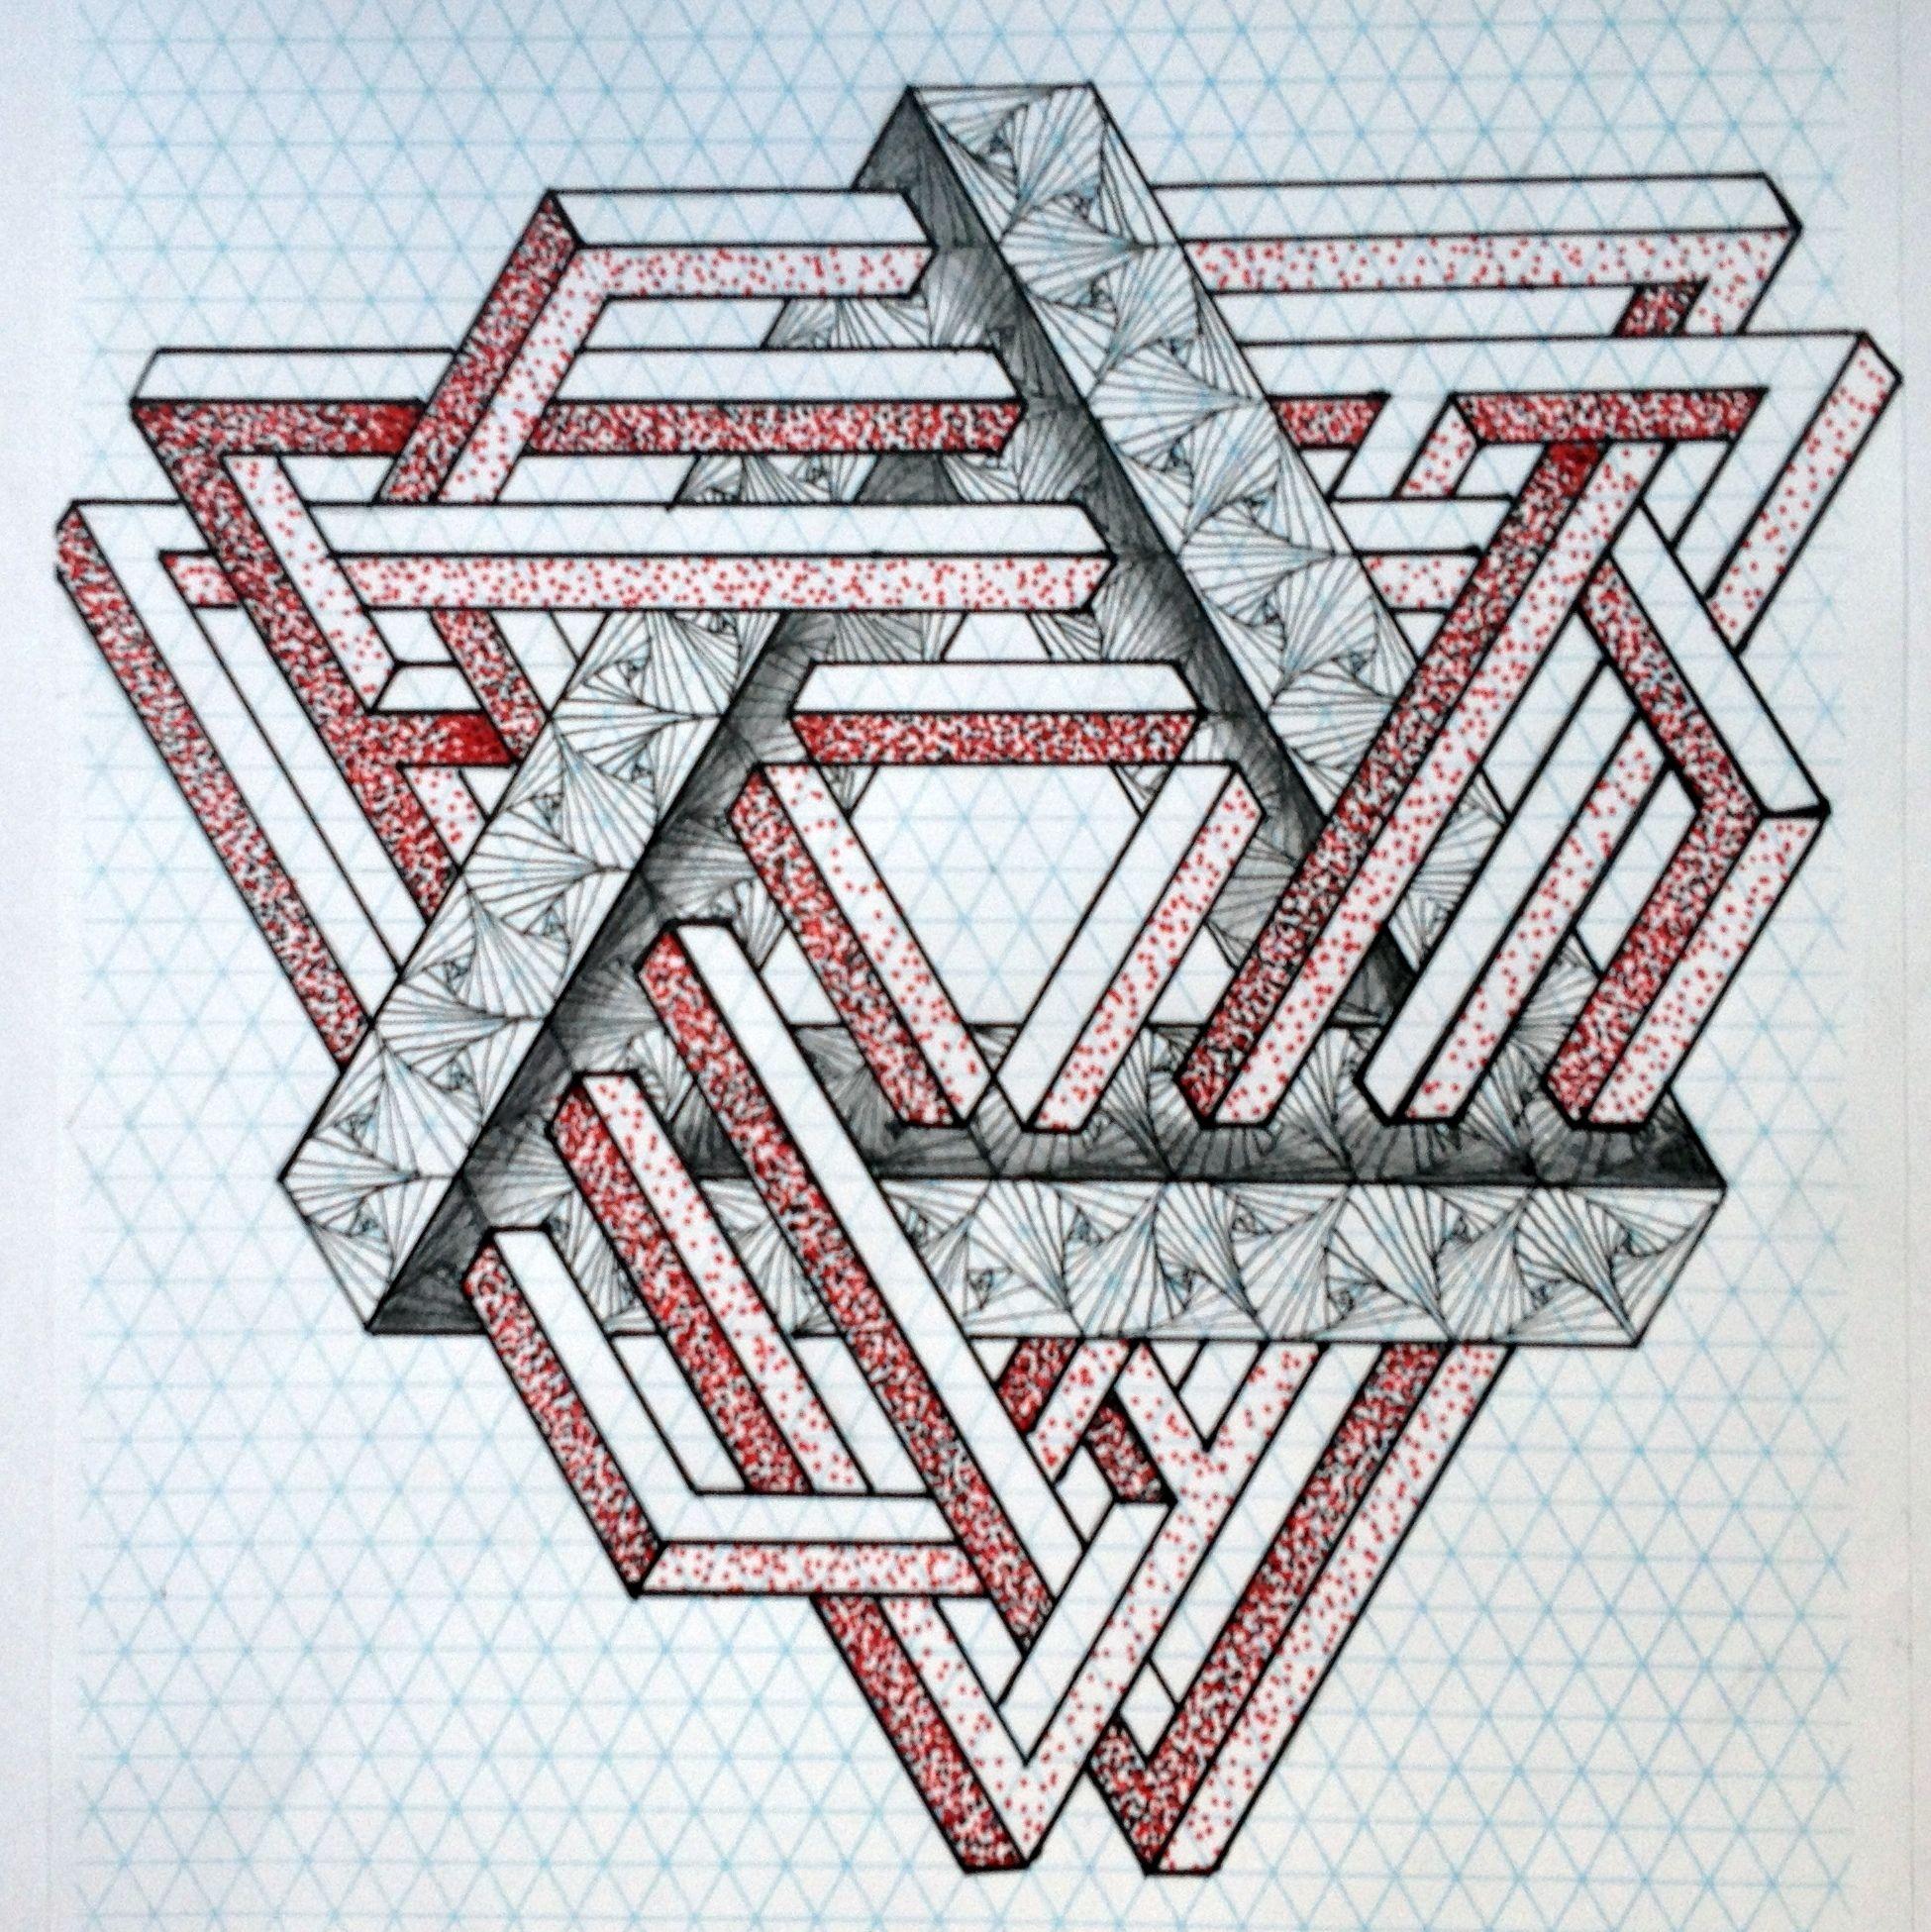 Impossible Opticalillusion Penrose Penrosetriangle Escher Mc Escher Oscar Reutersvard Triangle Iso Graph Paper Drawings Graph Paper Art Geometric Art